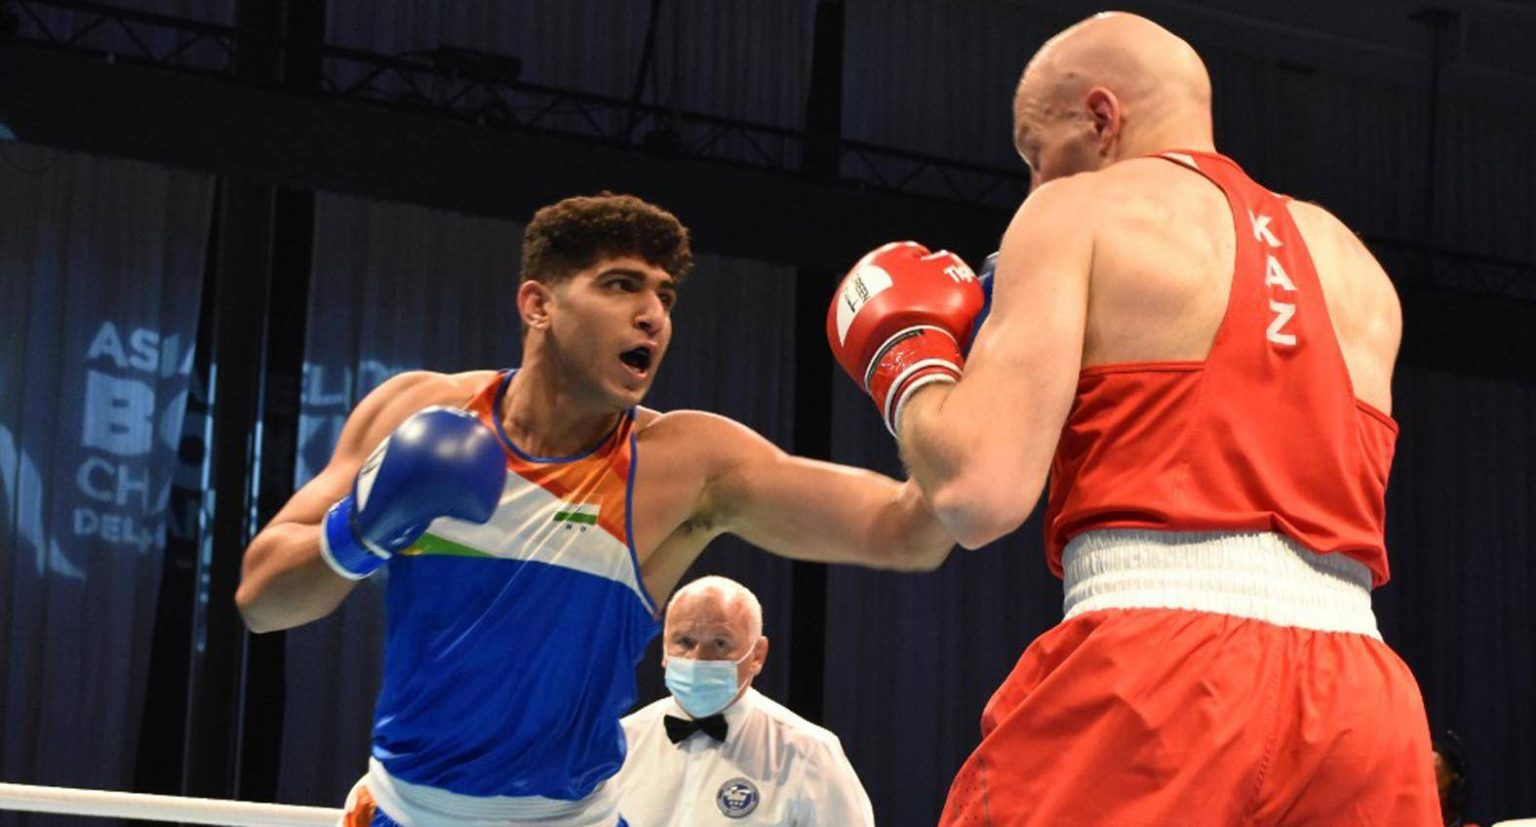 Asian Boxing Championship: India's Sanjeet Kumar wins gold medal   ఆసియా బాక్సింగ్ ఛాంపియన్ షిప్: భారత్ కు చెందిన సంజీత్ కుమార్ బంగారు పతకం సాధించాడు  _40.1